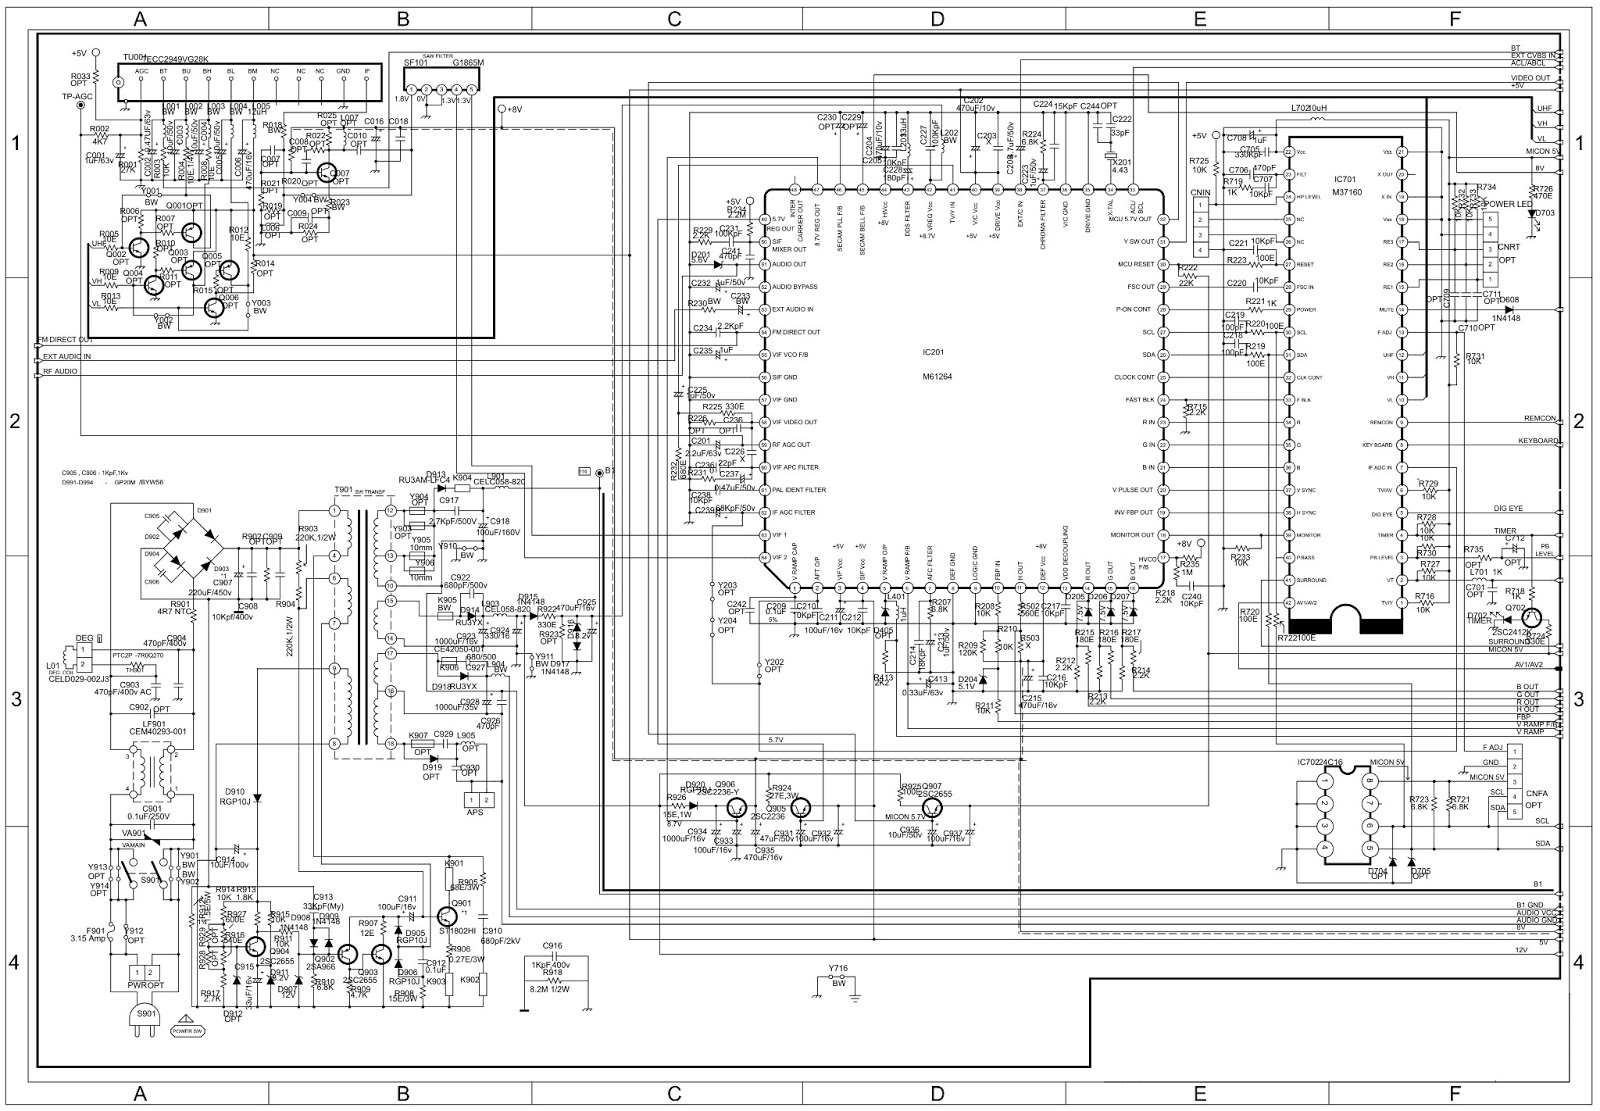 ics wiring diagram onida igo onida delite 21 onida delite 14  [ 1600 x 1111 Pixel ]